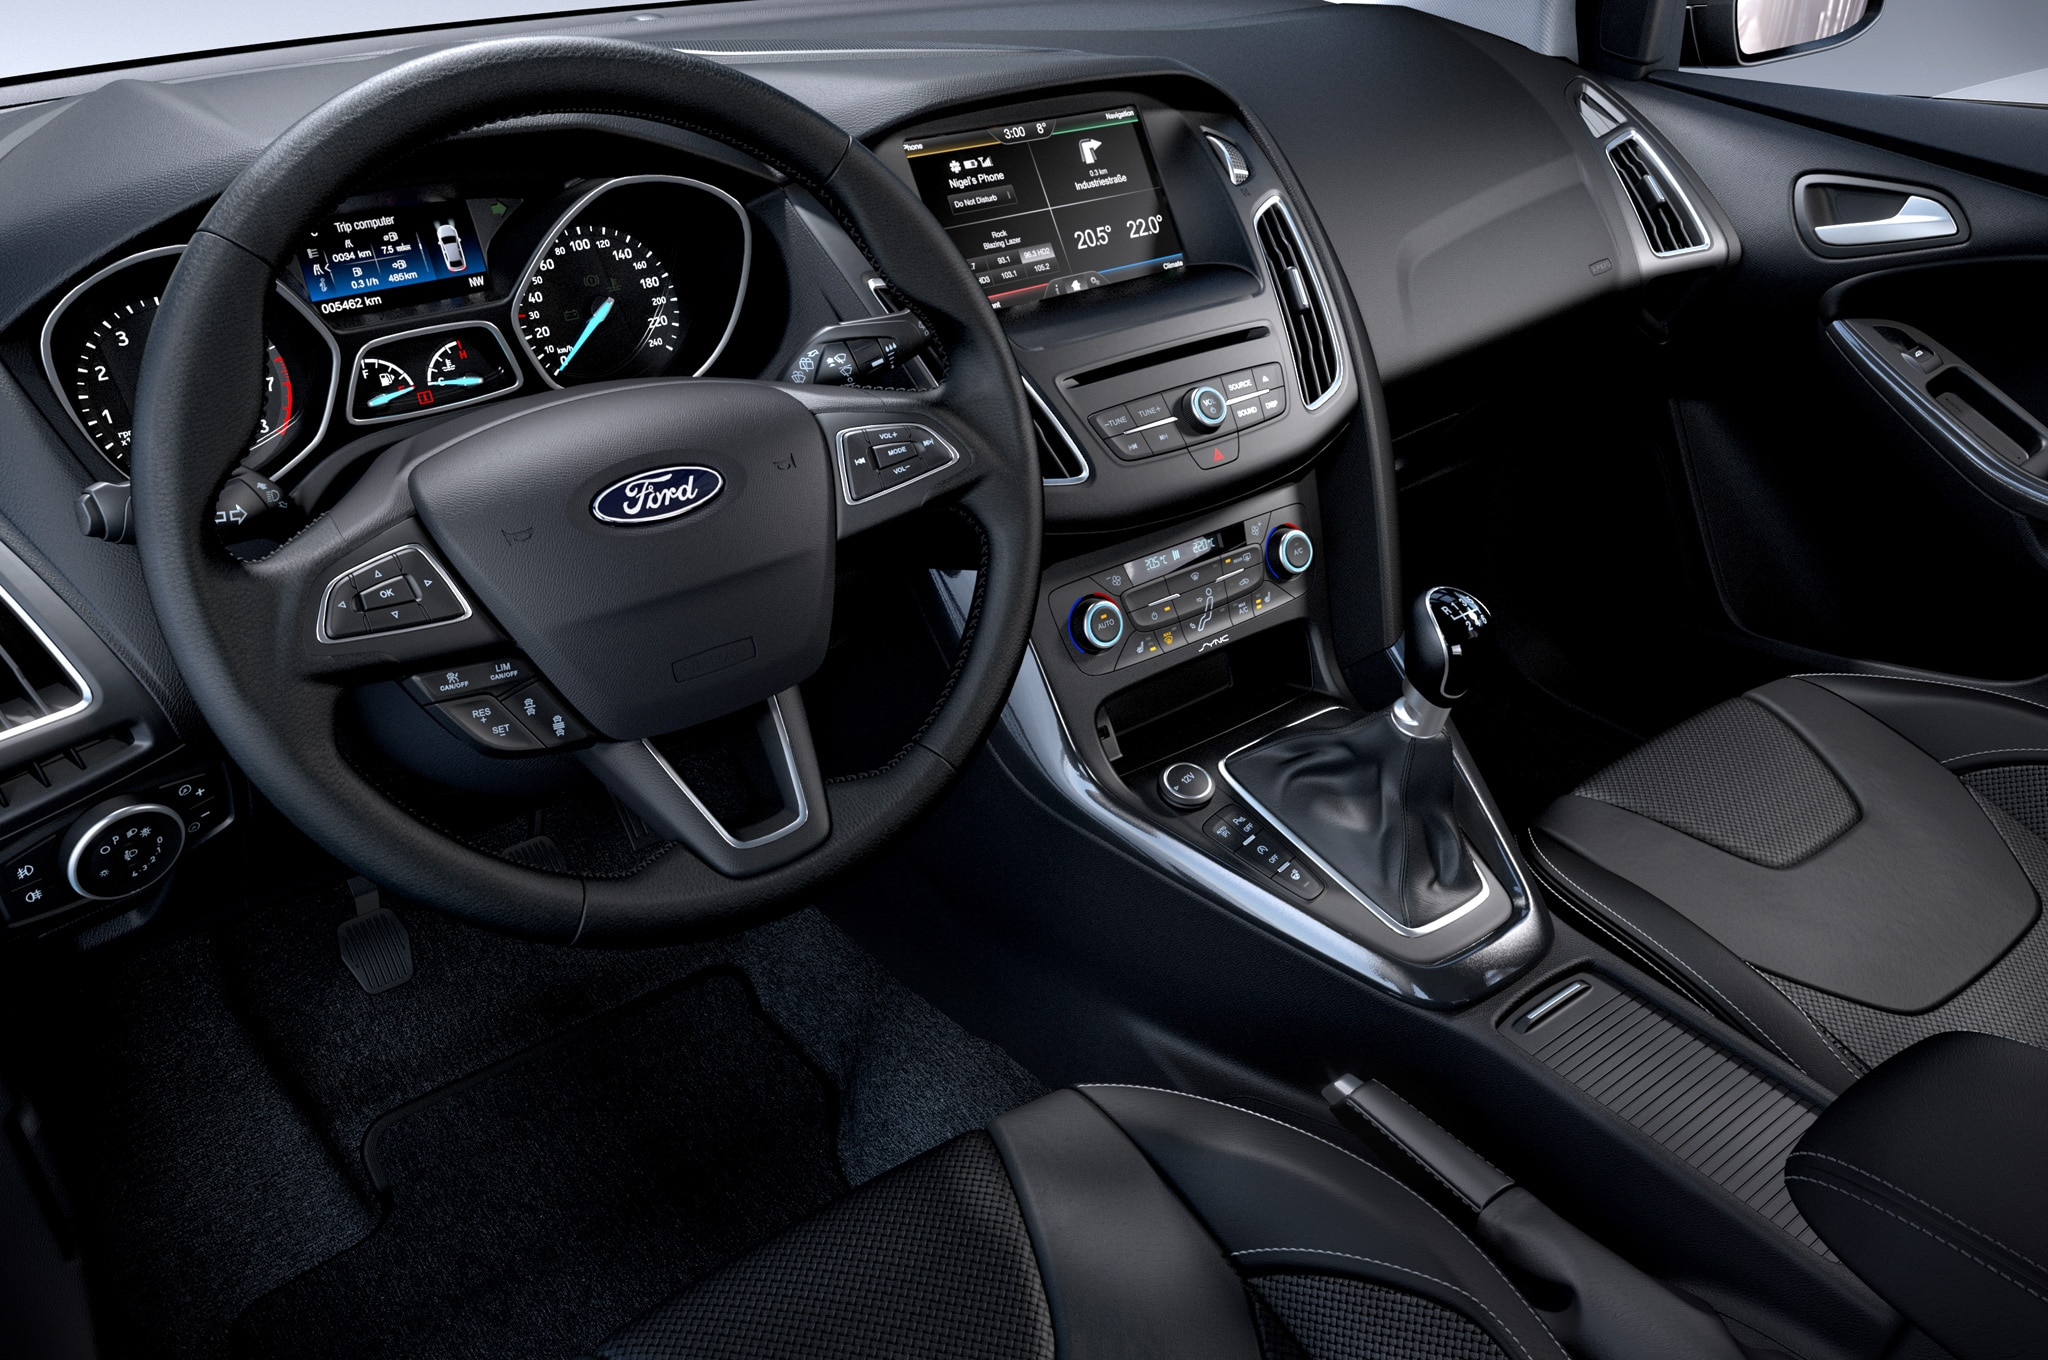 2015 ford focus titanium hatchback review rh automobilemag com